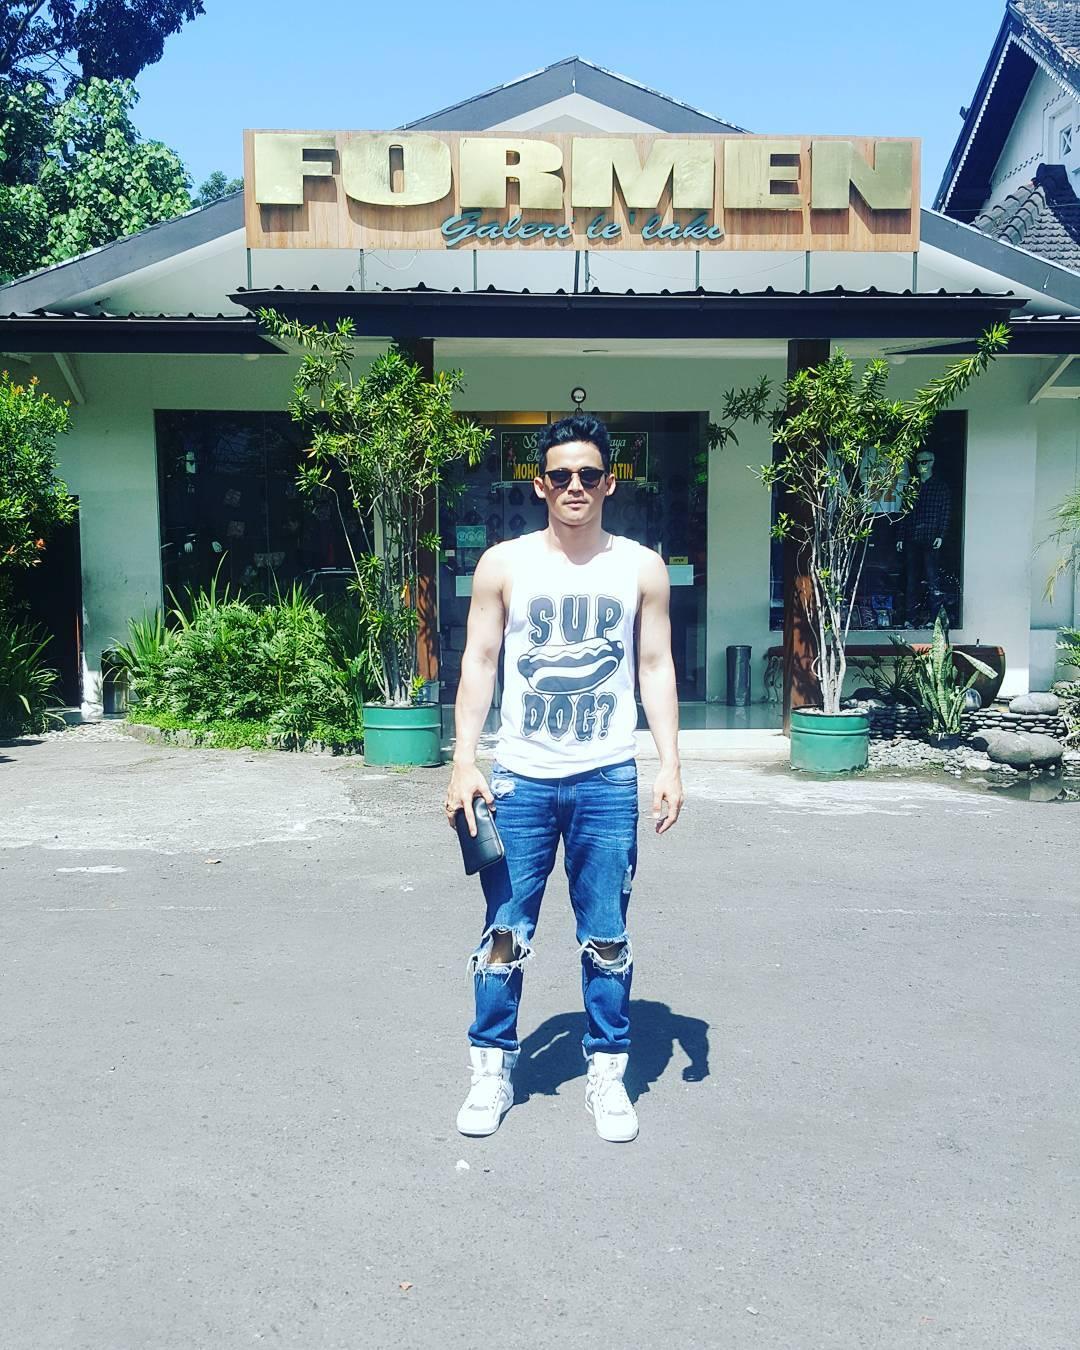 Formen, Formen Bandung, Bandung, Kota Bandung, Dolan Dolen, Dolaners Formen via bobbiteguh - Dolan Dolen